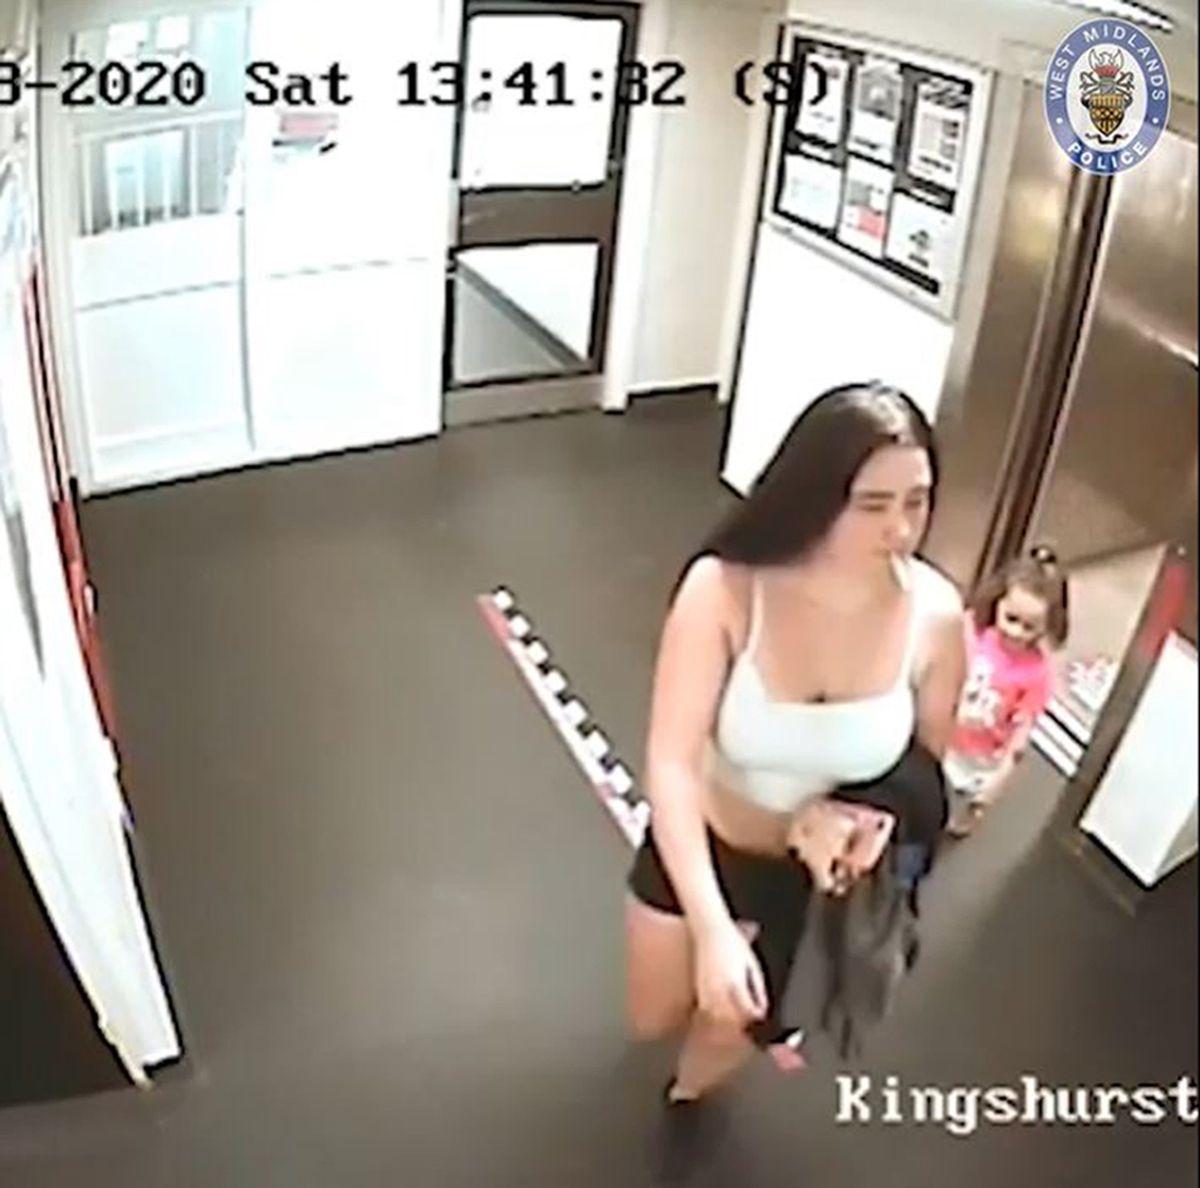 Kaylee-Jayde Priest, shown in a CCTV still just hours before her death